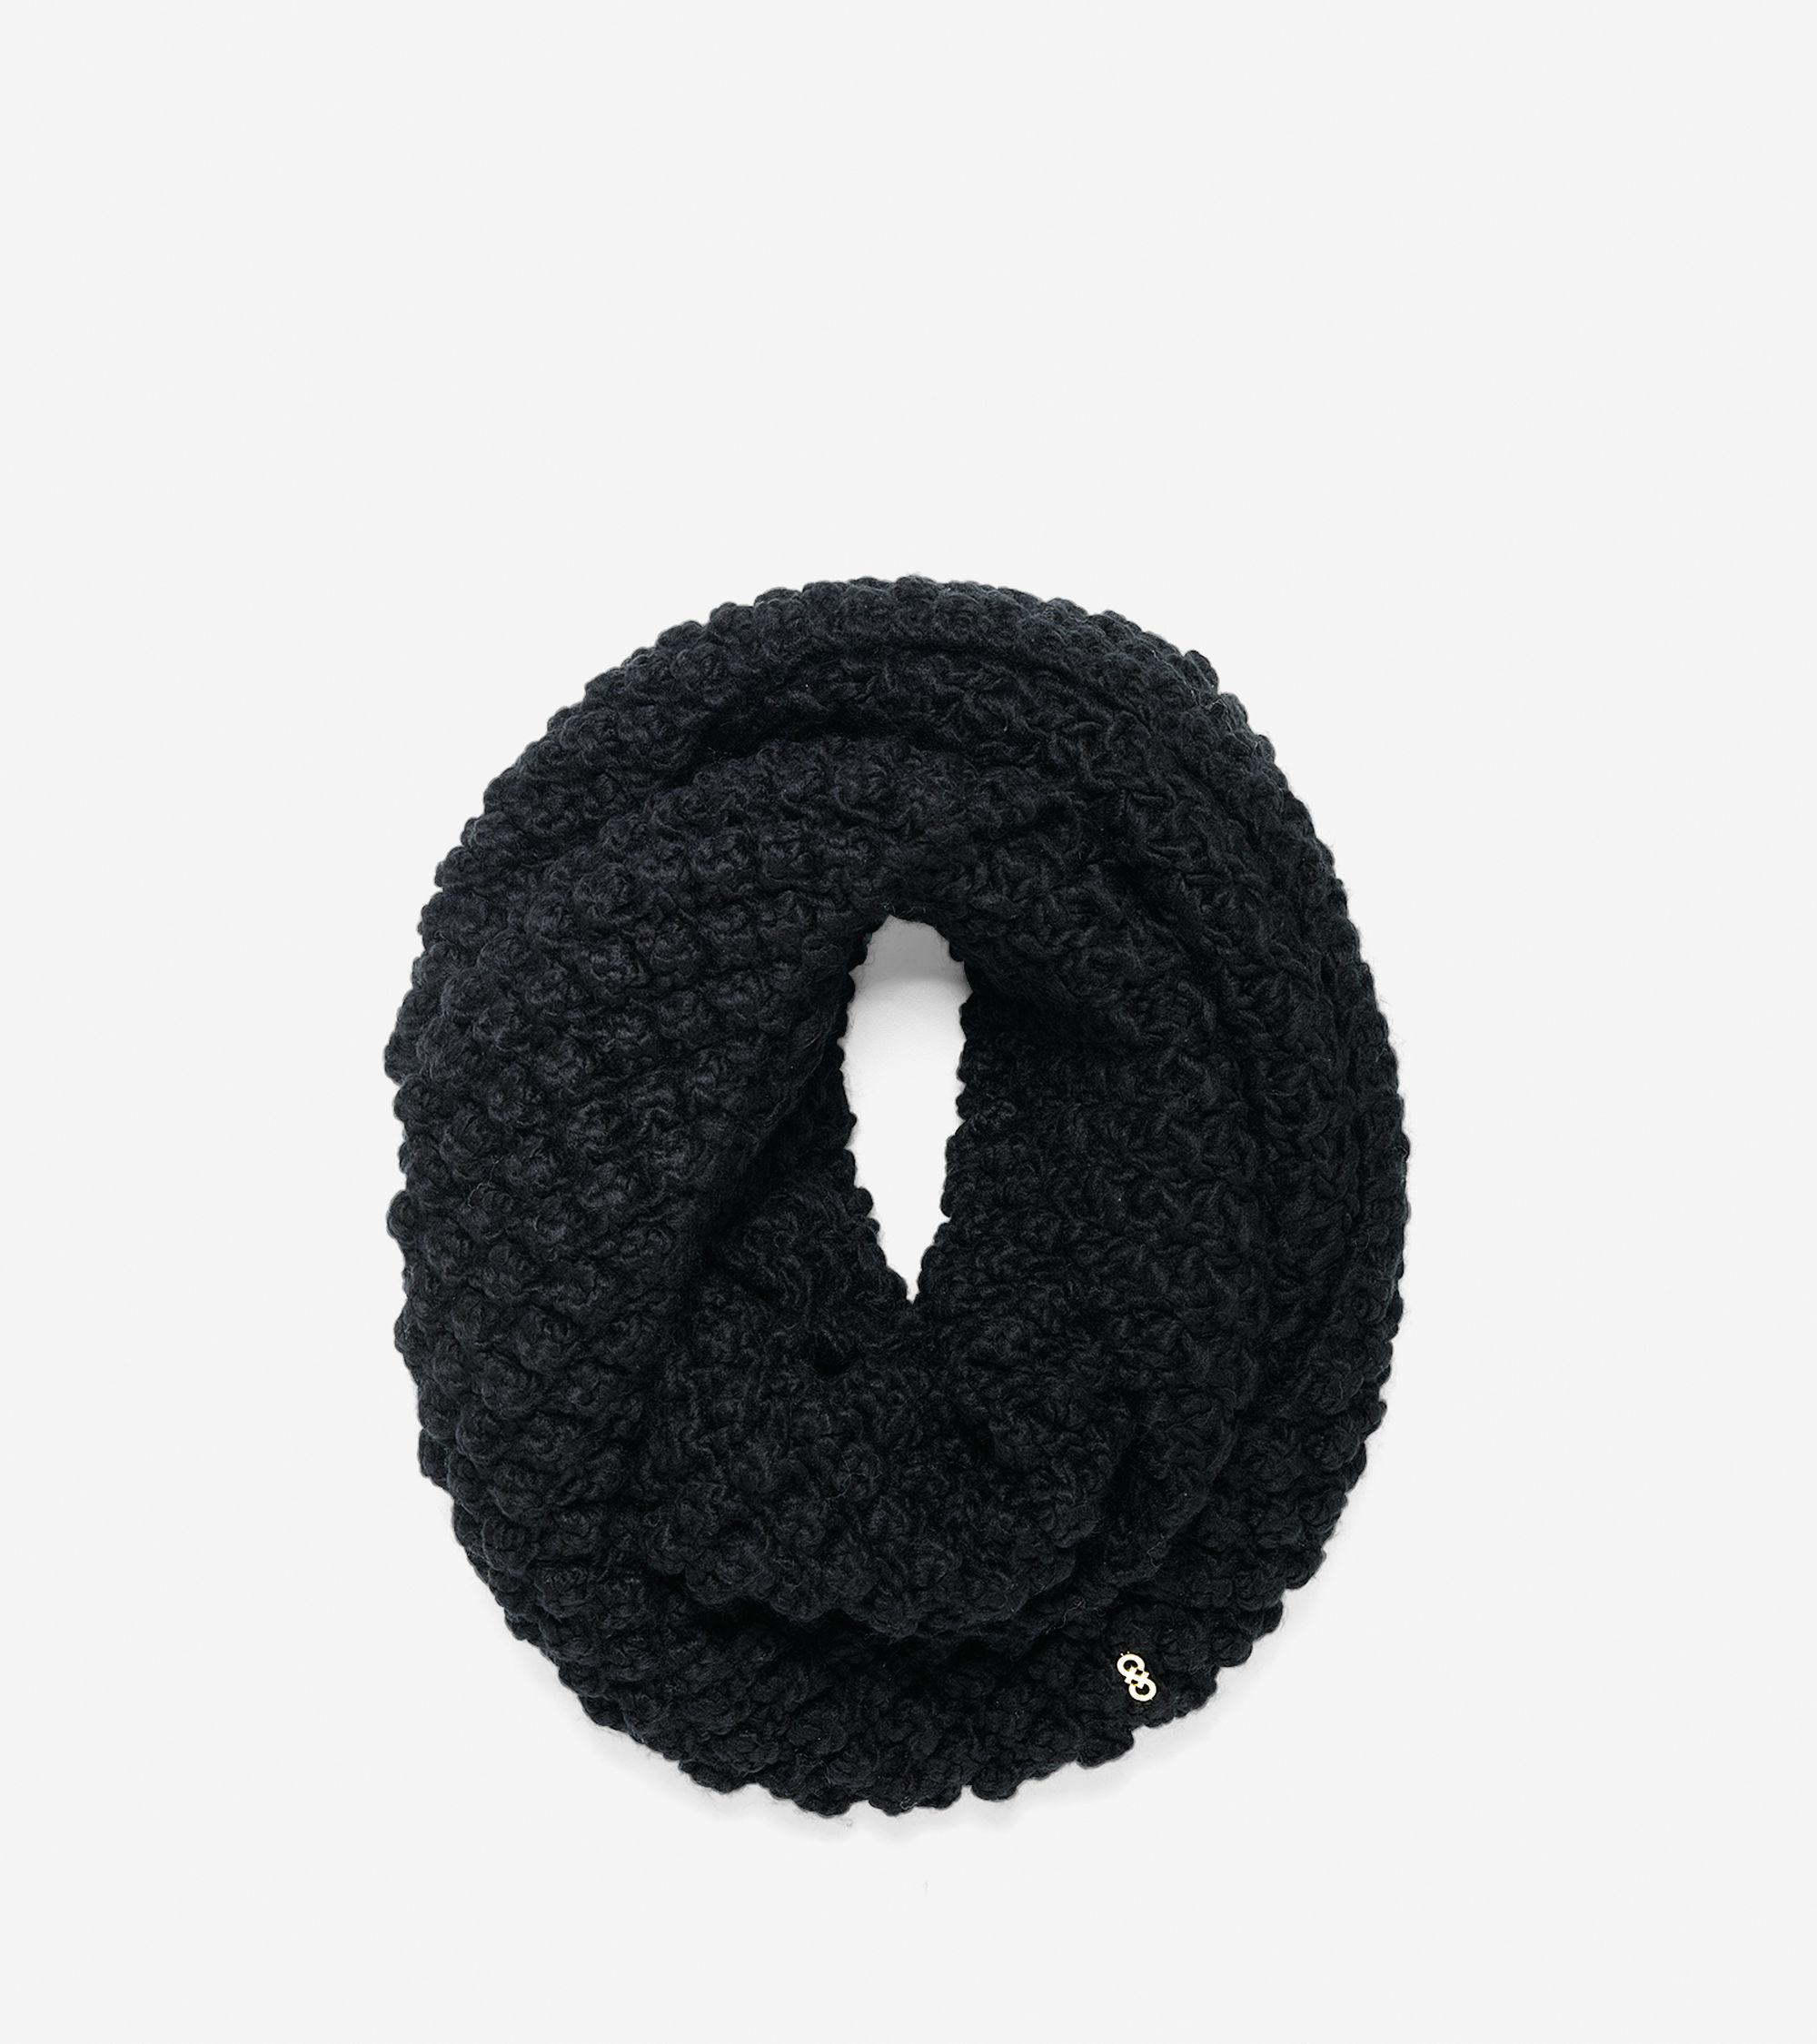 Lyst - Cole Haan Popcorn Stitch Infinity Scarf in Black